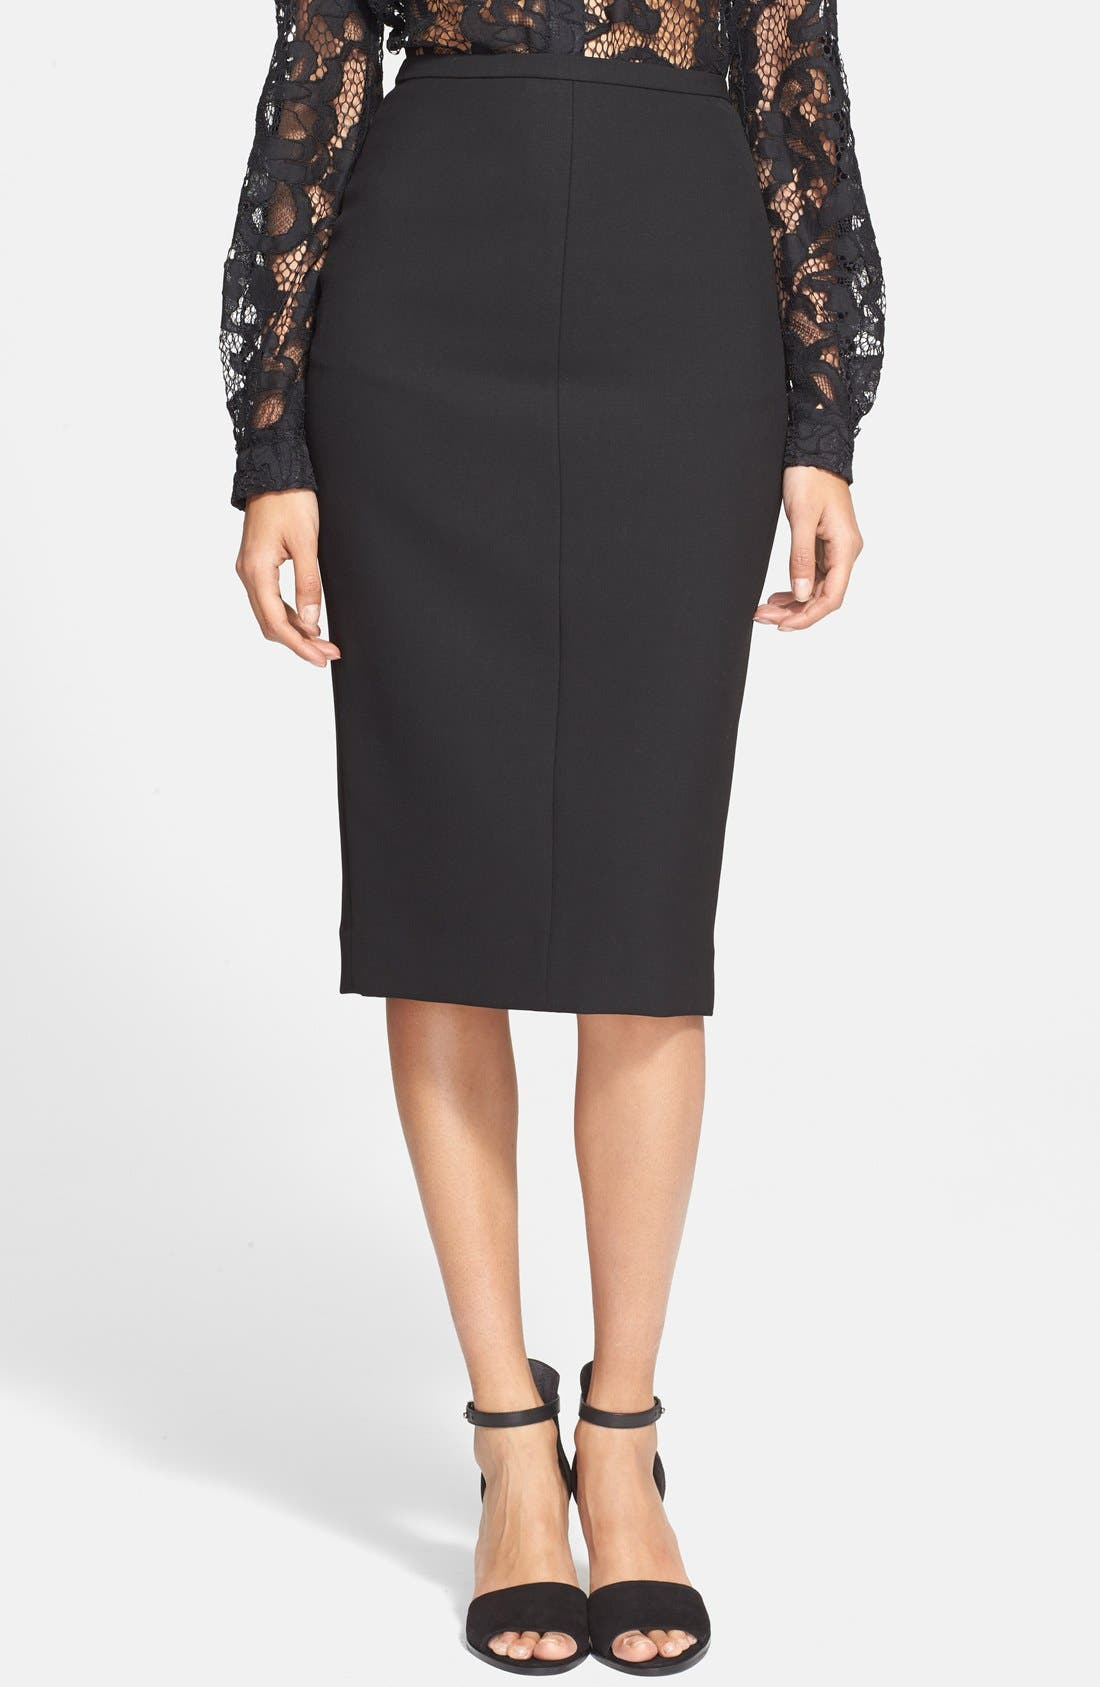 Alternate Image 1 Selected - Diane von Furstenberg 'Samara' Pencil Skirt